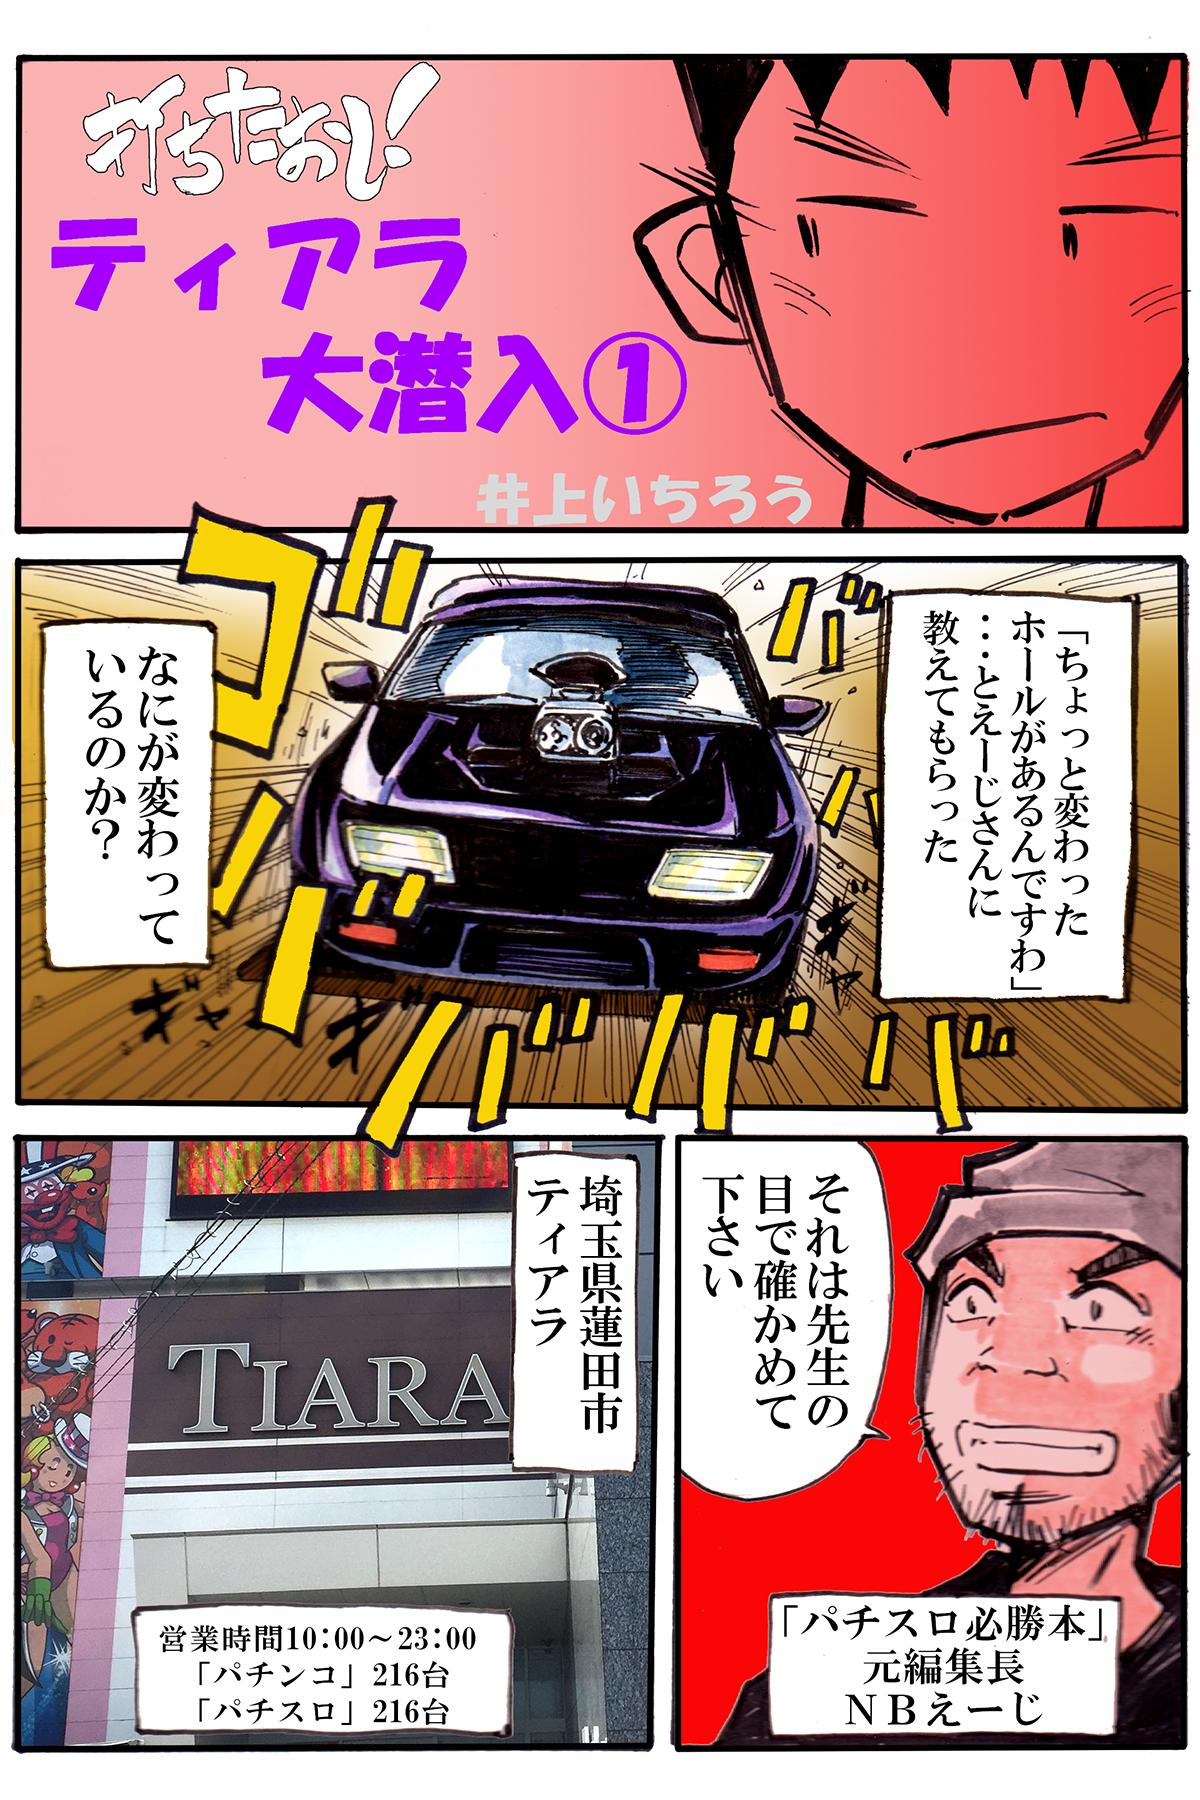 vol.1-1ティアラ大潜入